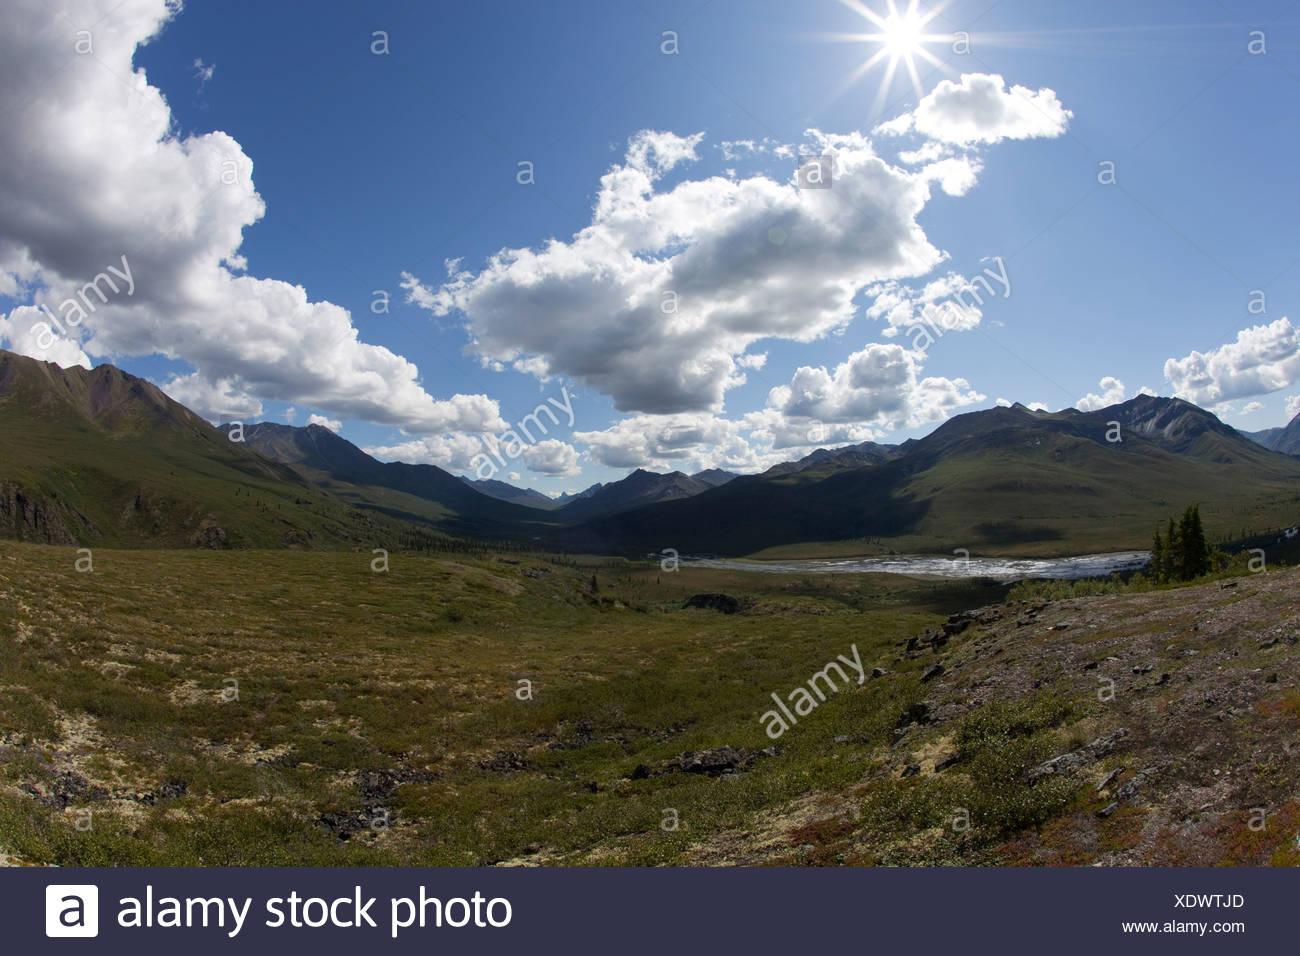 Ogilvie Mountains, Tombstone Range, North Klondike River valley, Tombstone Territorial Park, Yukon Territory, Canada - Stock Image